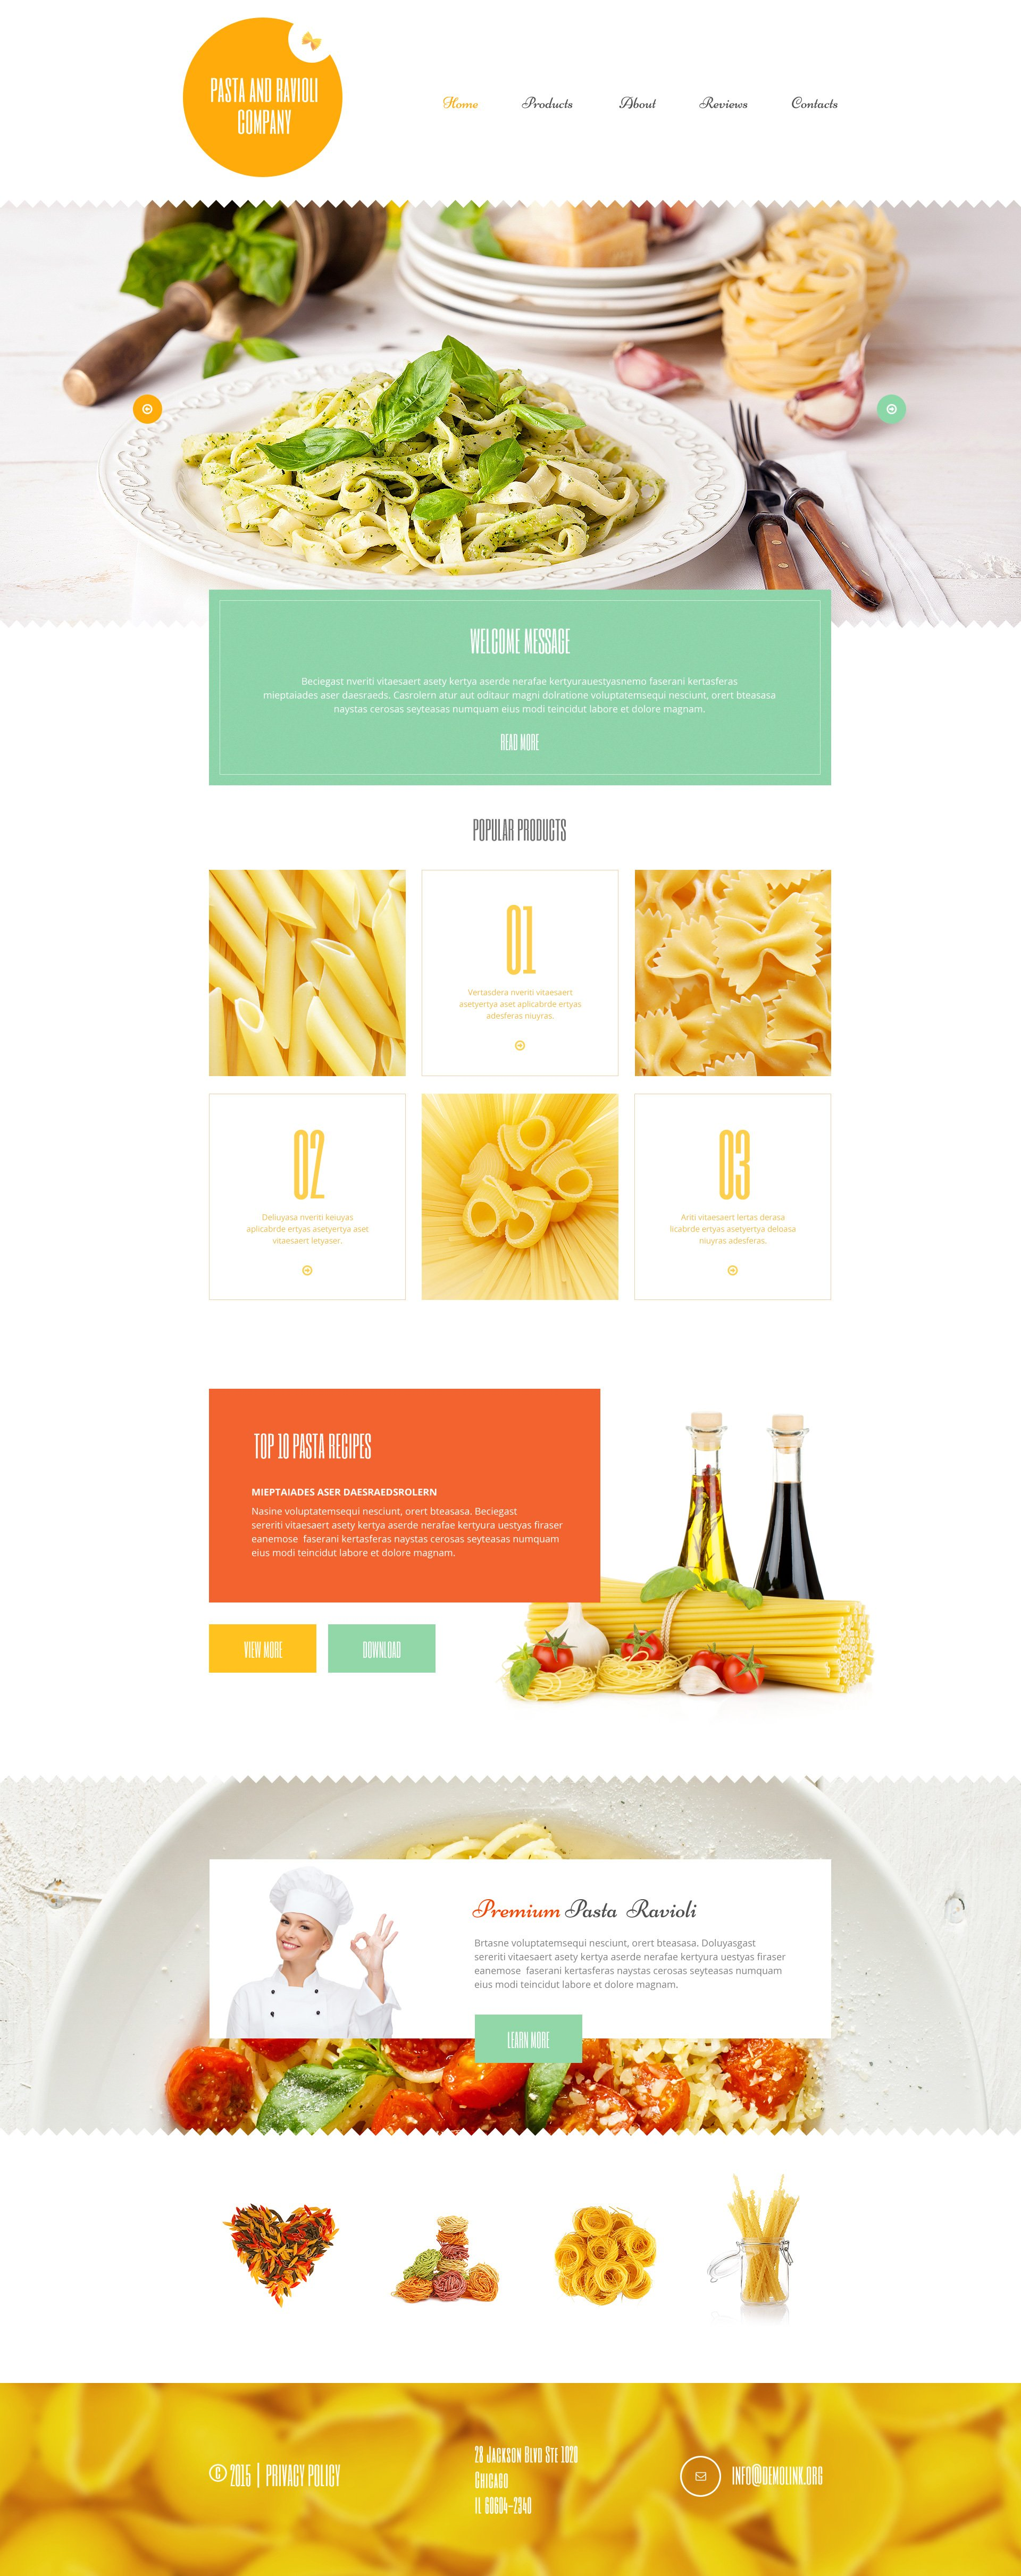 Pasta and Ravioli Company Tema WordPress №55187 - screenshot